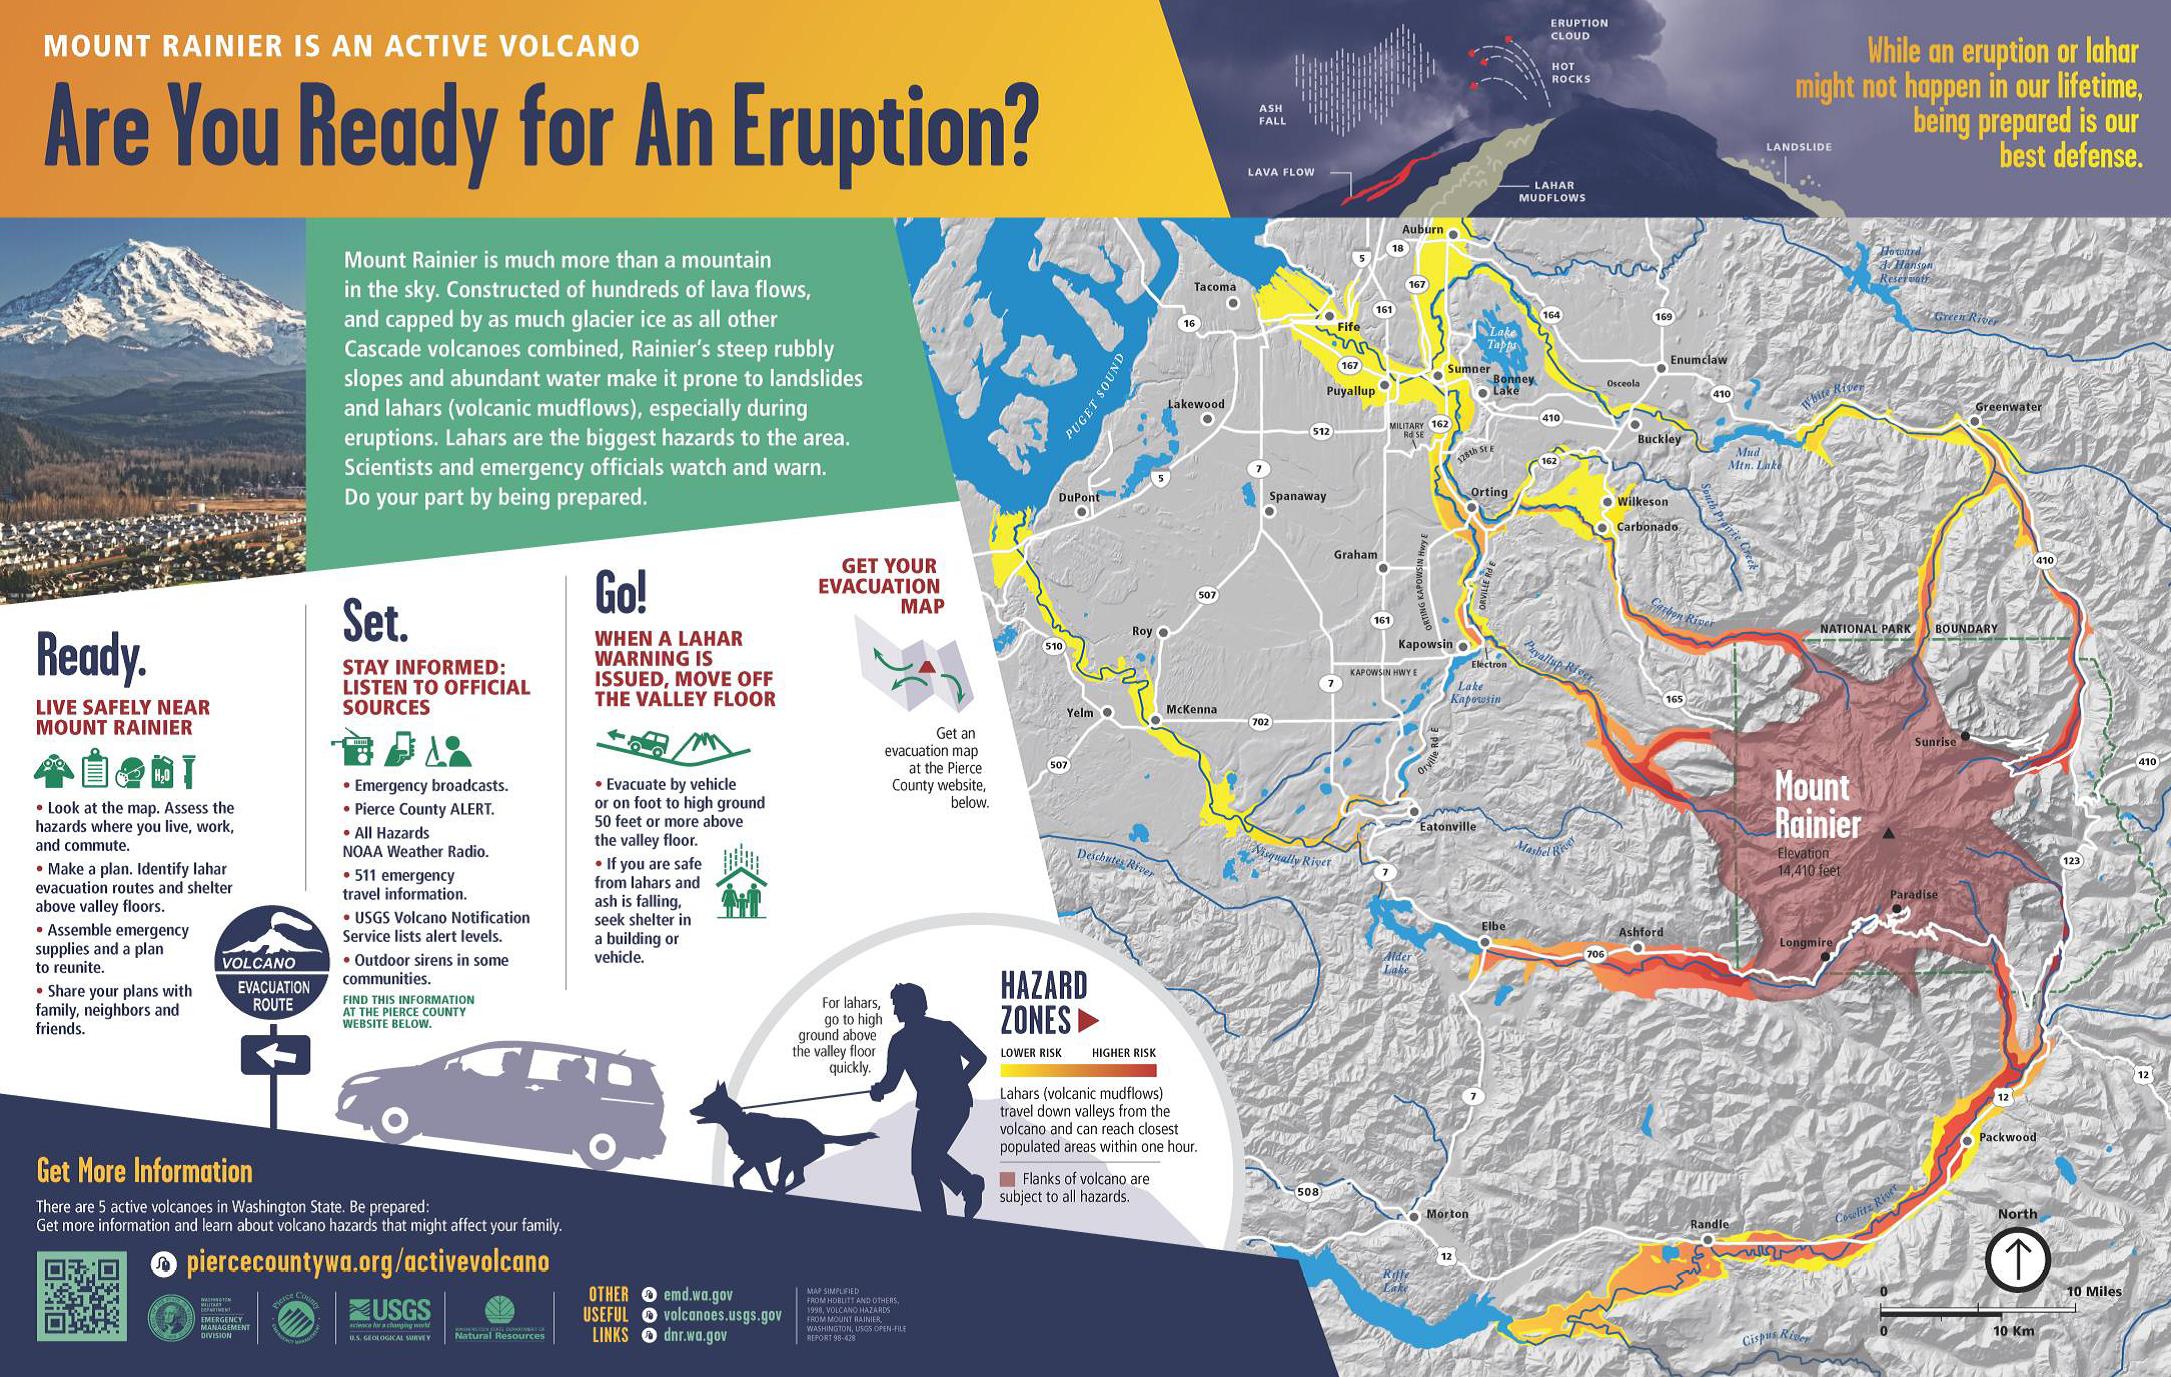 Mount Rainier: Landmark is nation's most potentially